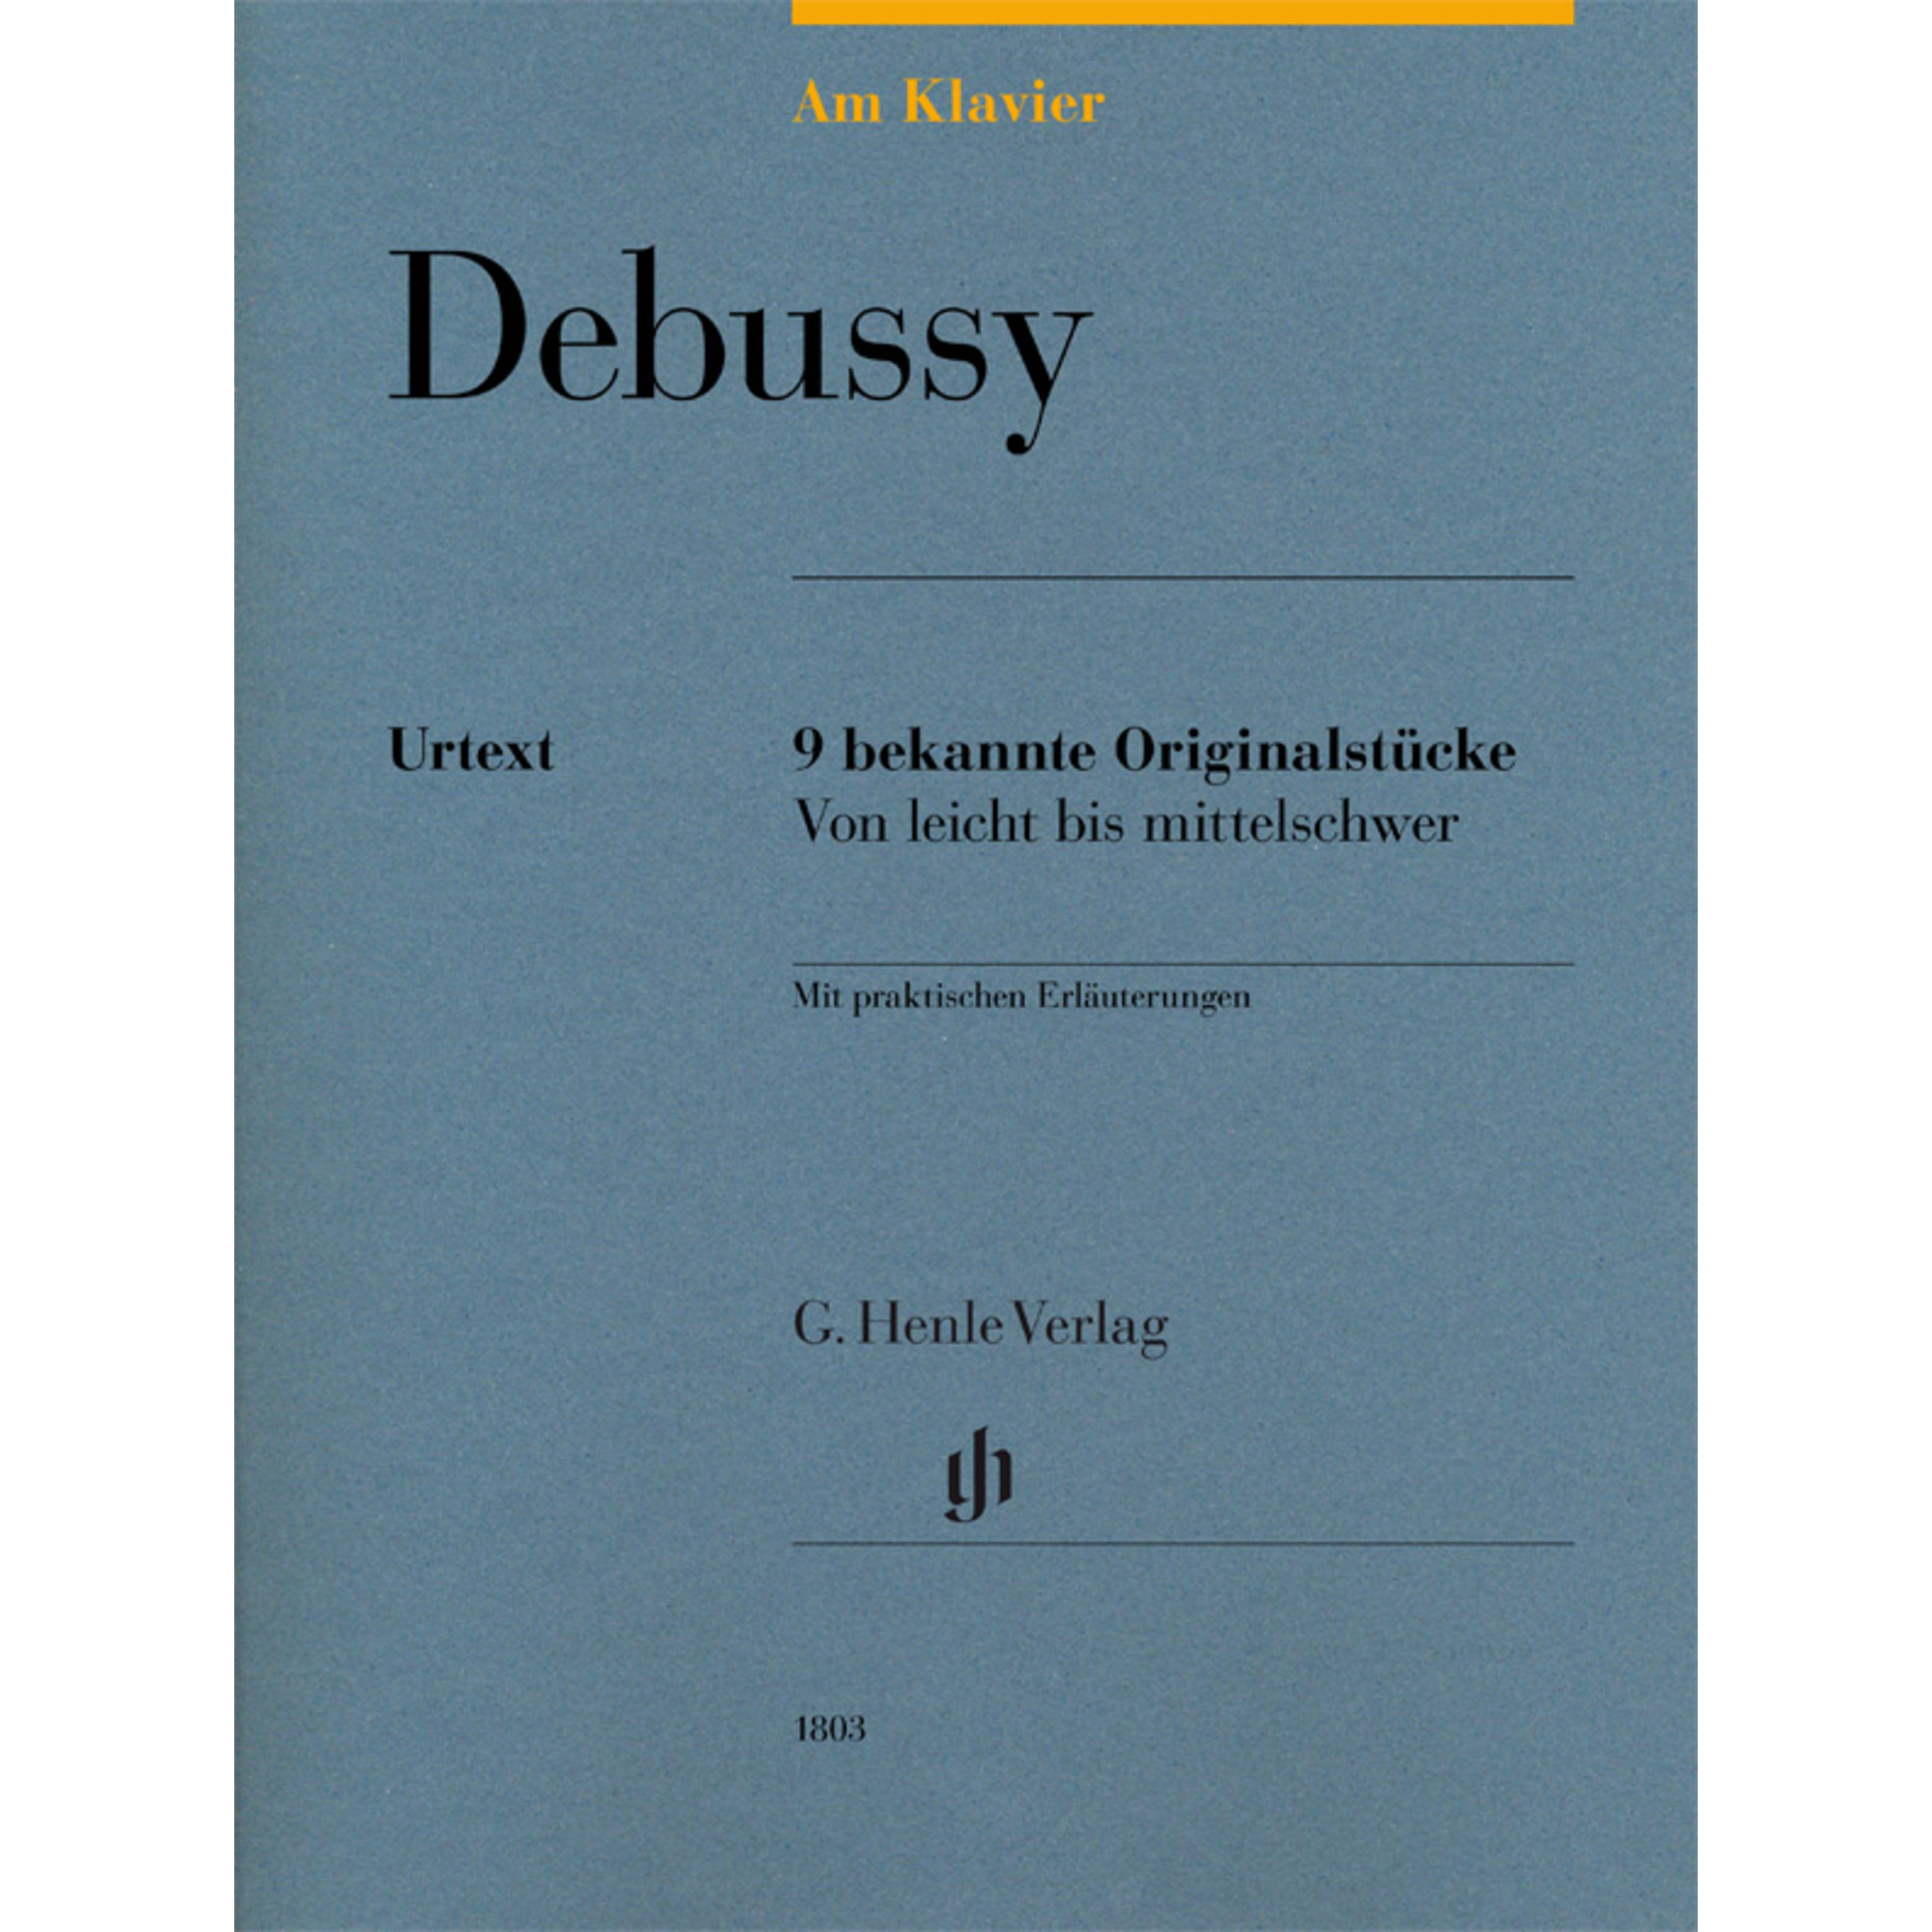 Henle Verlag - Claude Debussy: Am Klavier HN 1803